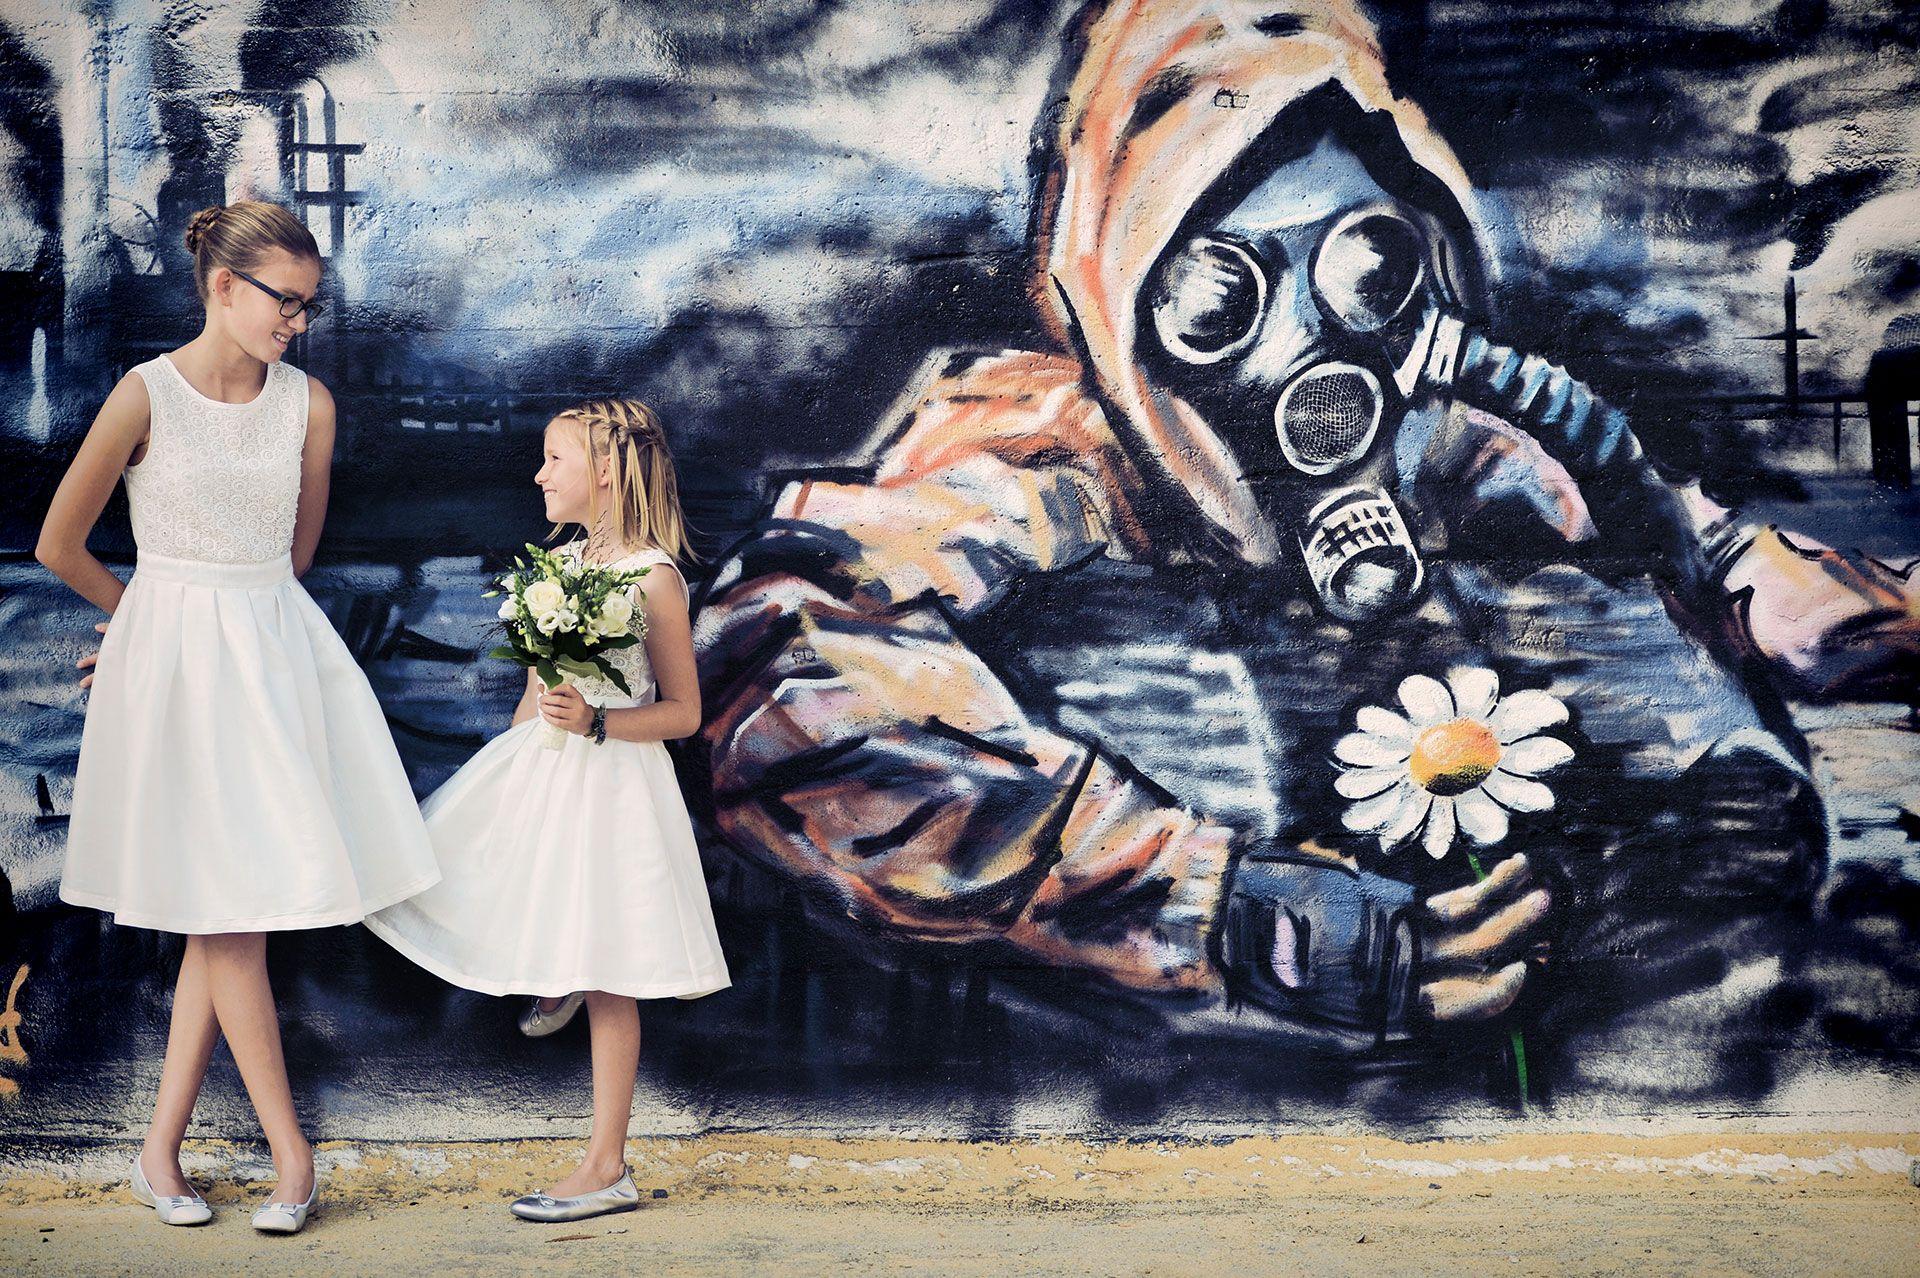 Bruidsmeisjes met graffiti.